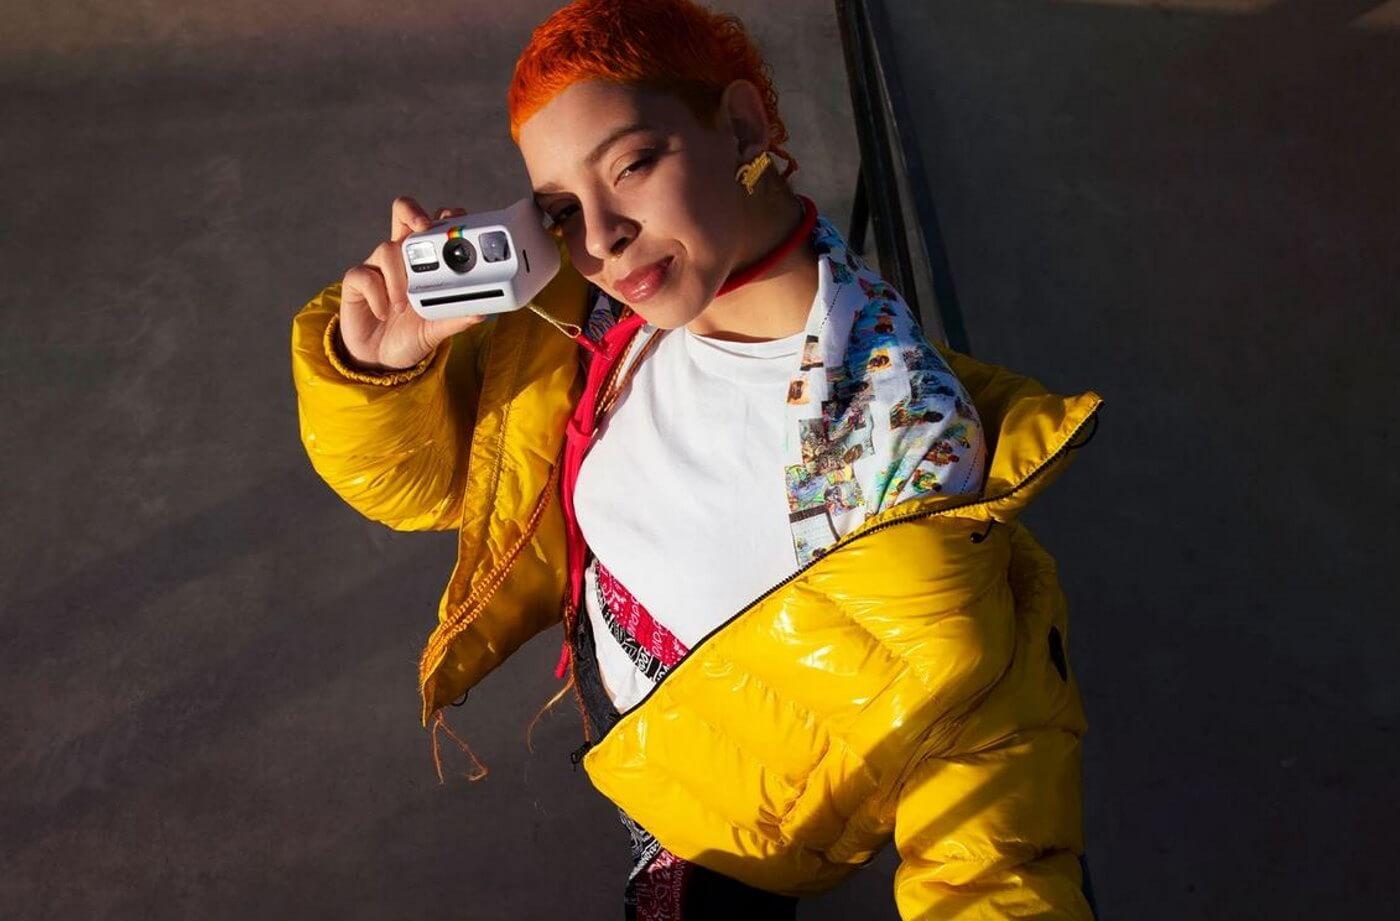 polaroid go world's smallest instant camera 3